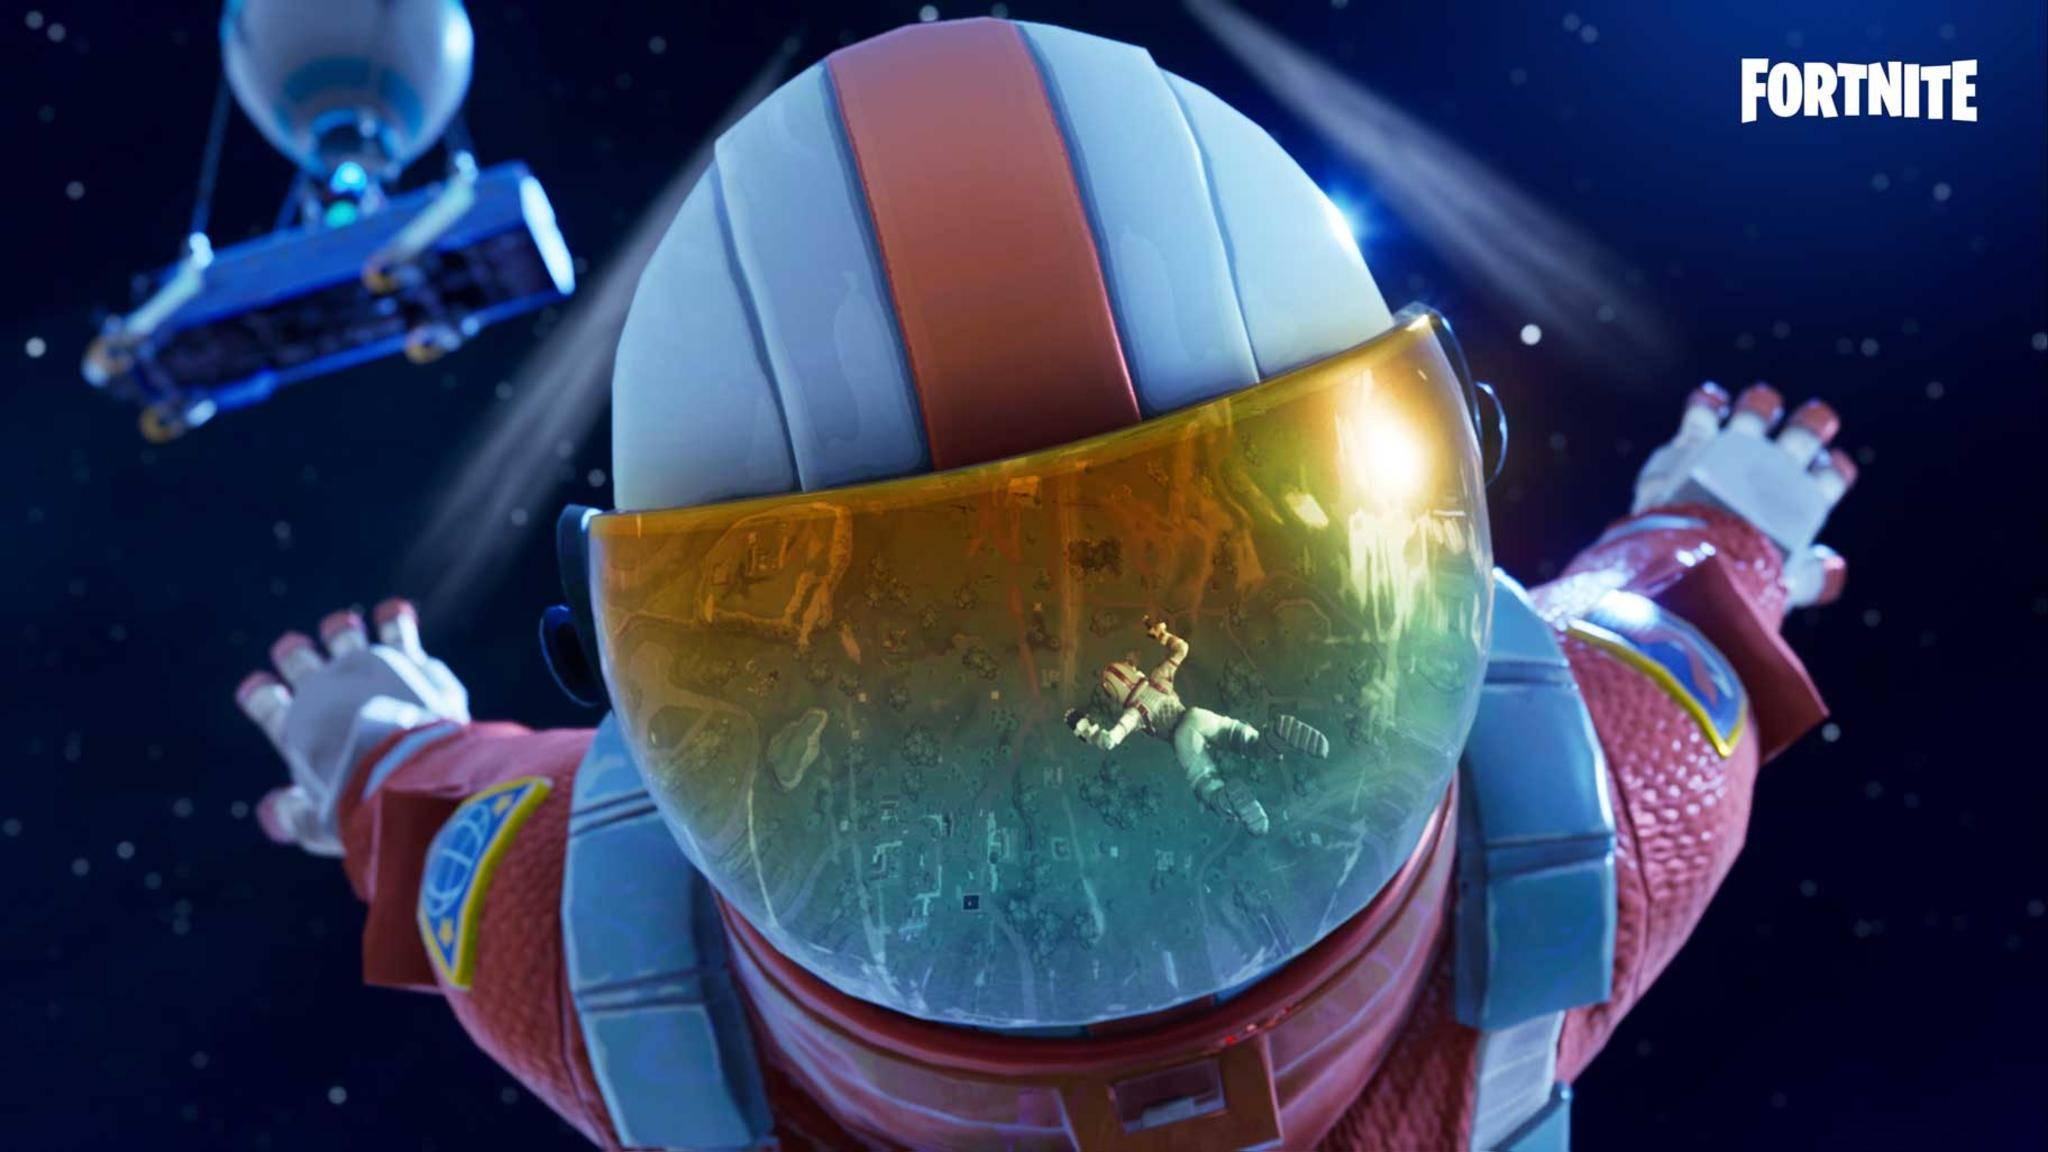 Fortnite Battle Royale Season 3 mit neuem Battle Pass gestartet